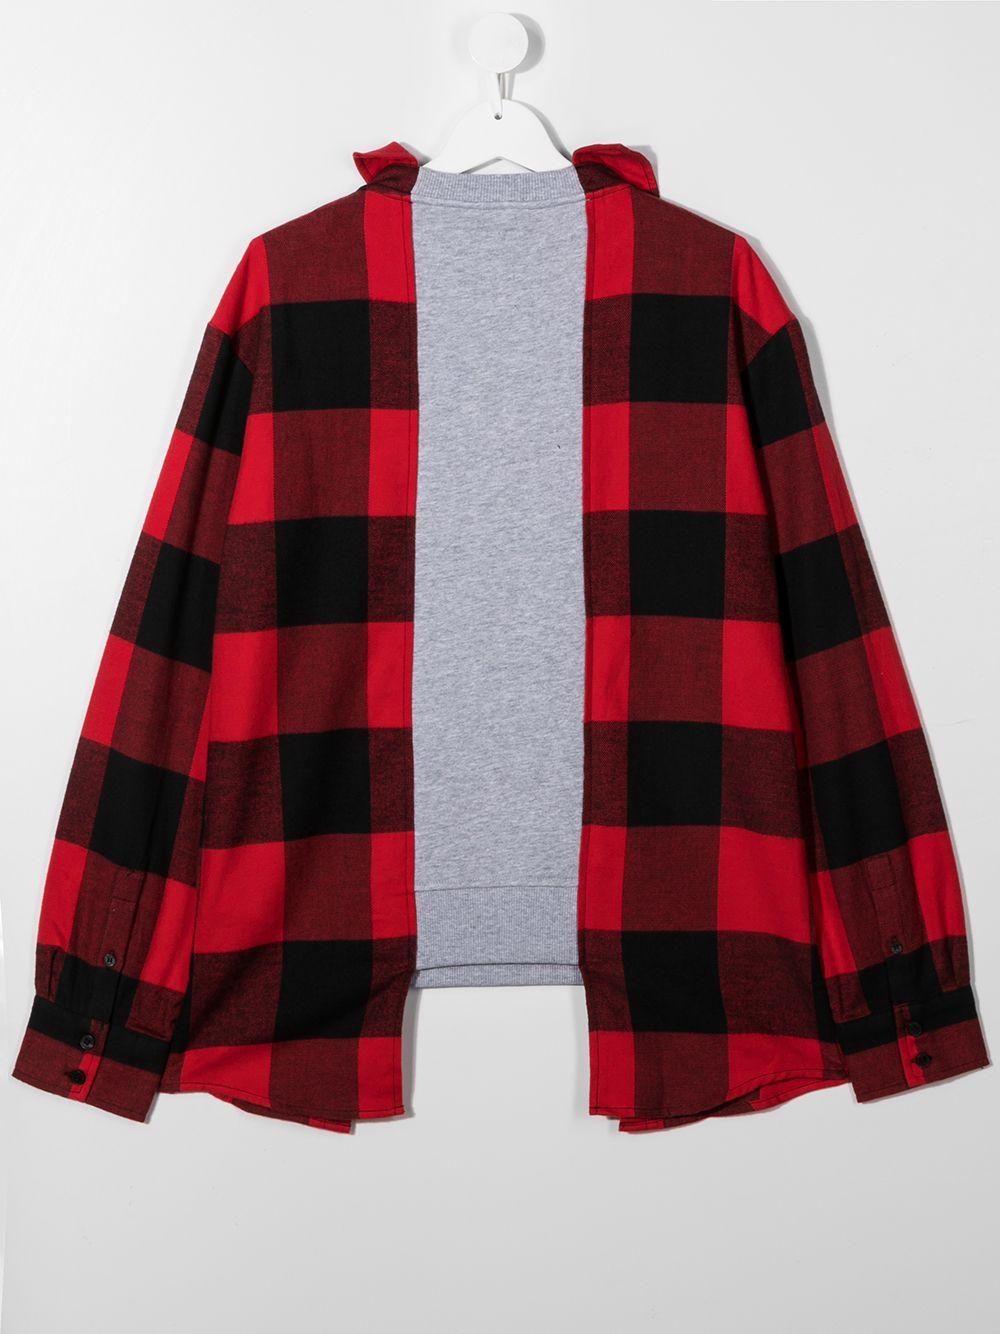 MOSCHINO KIDS   Sweatshirt   HUF04AN0Z0680462T